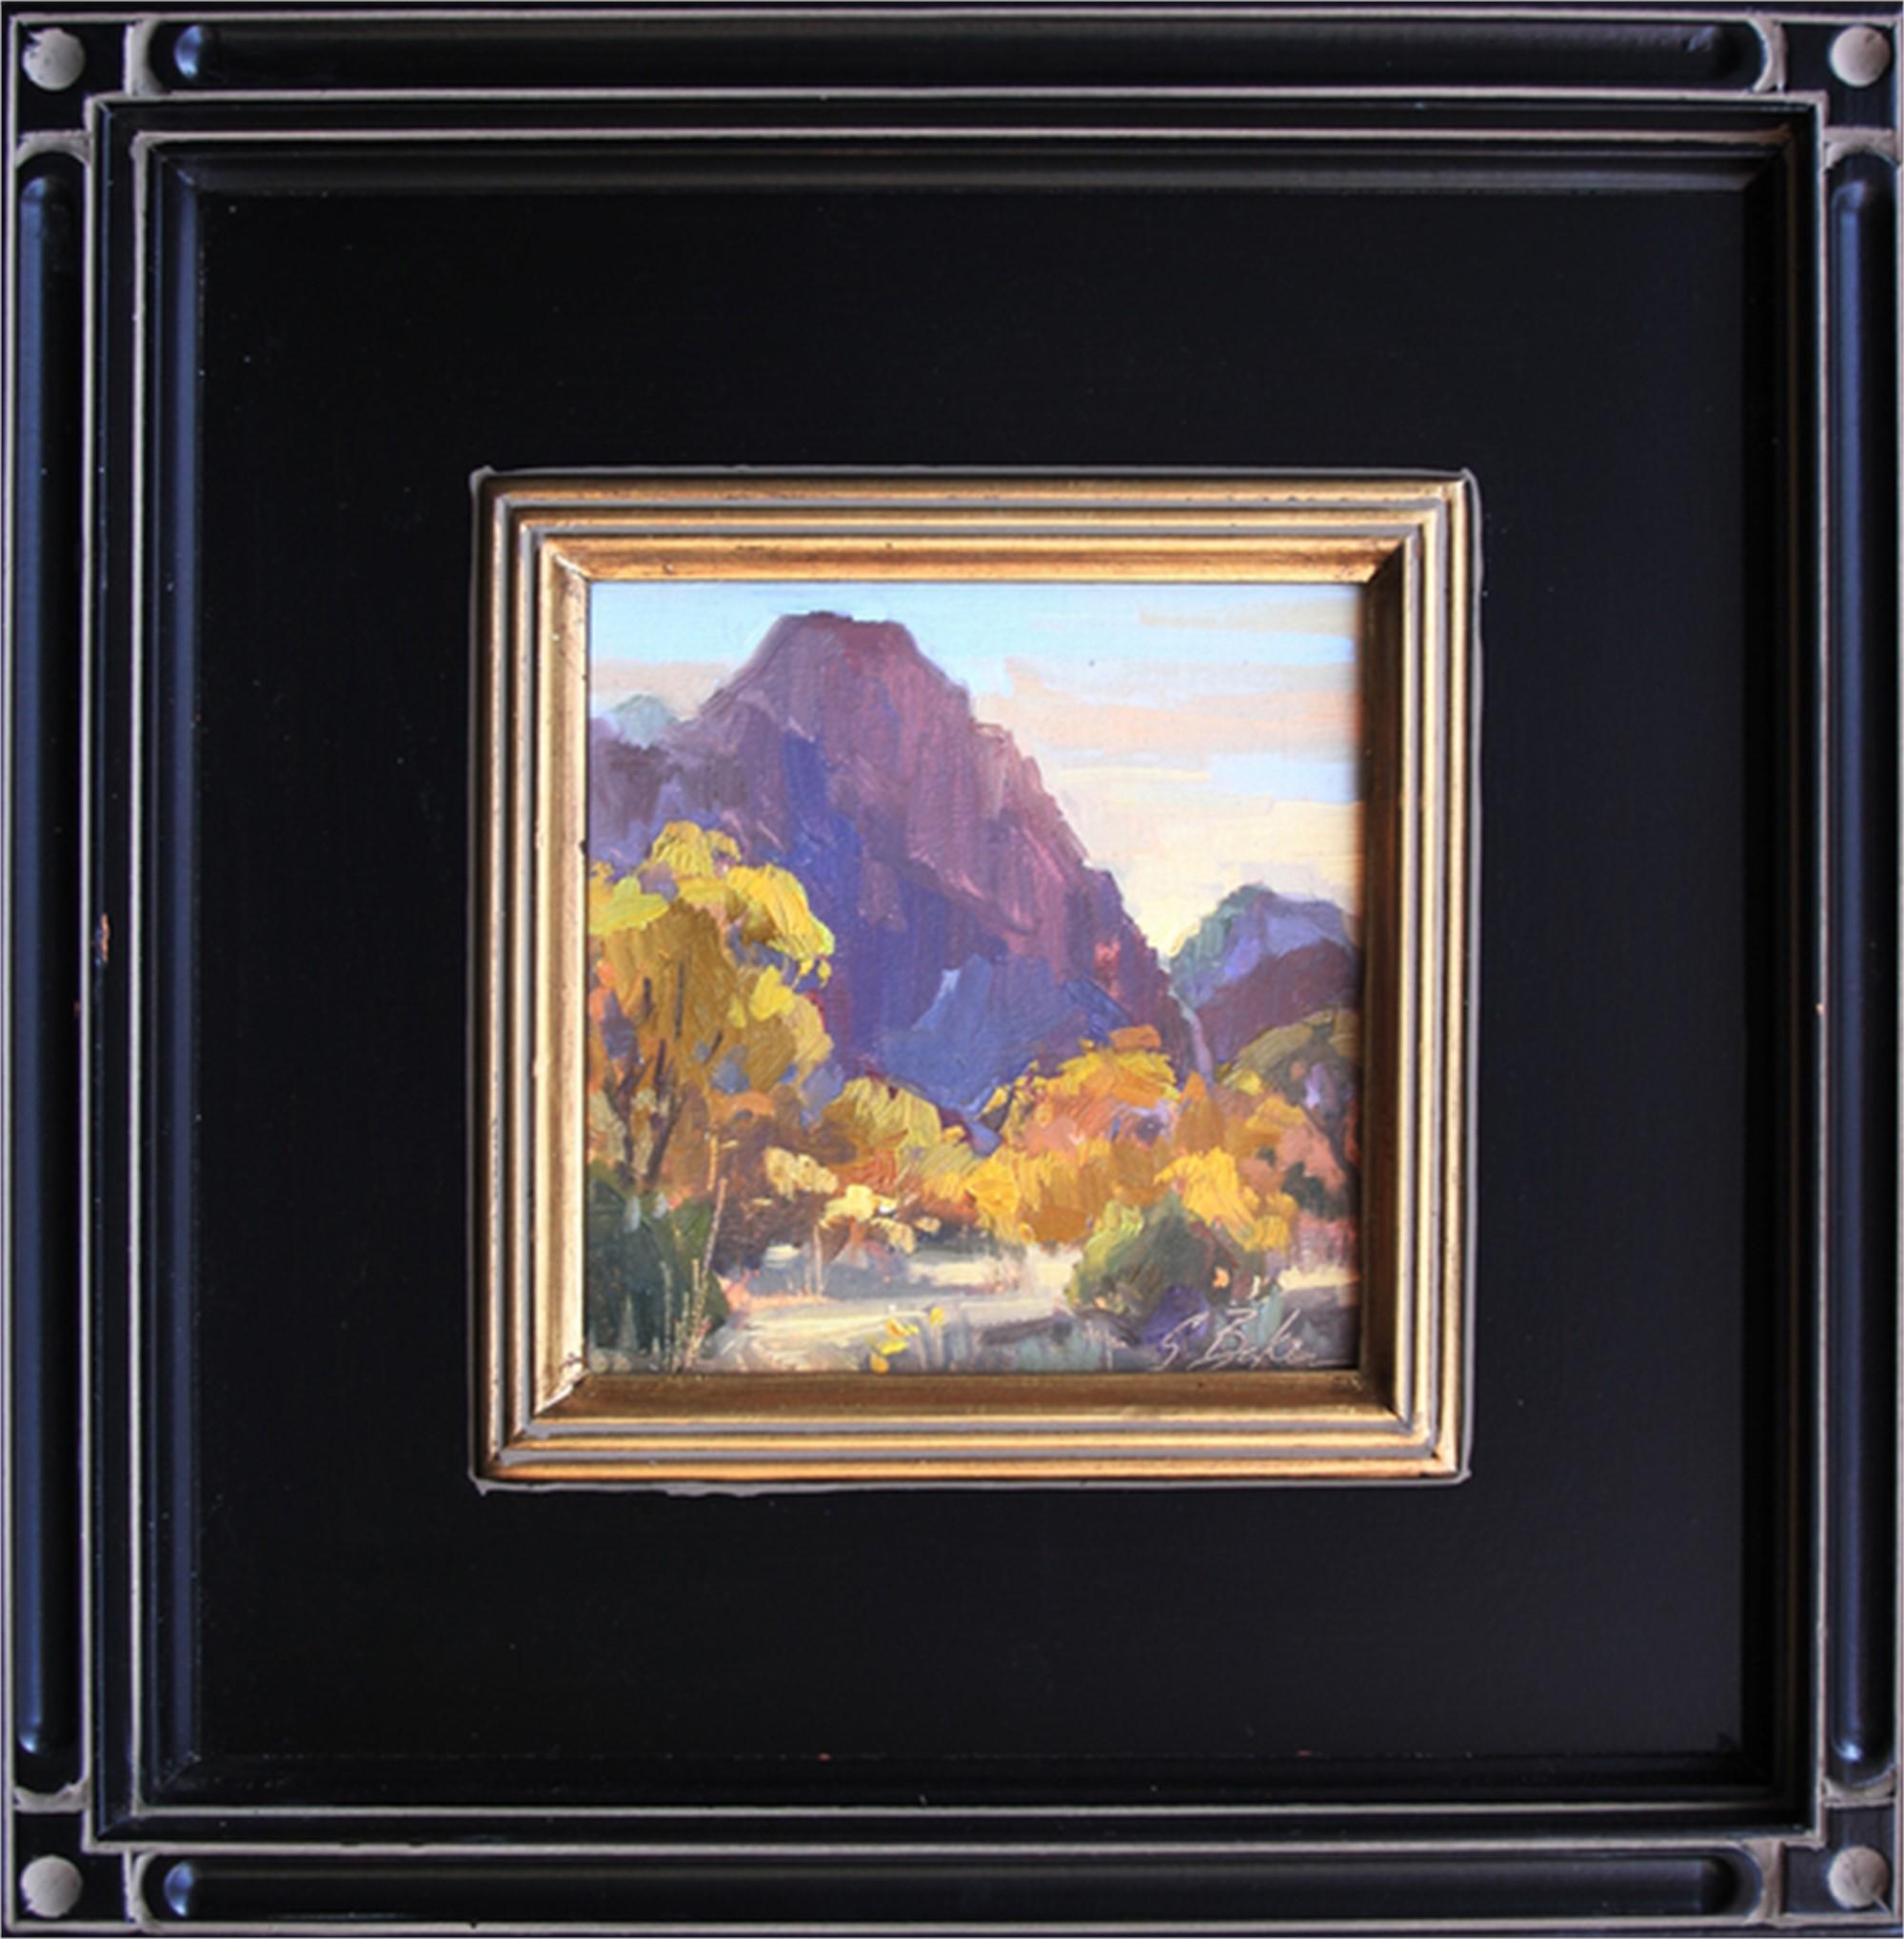 Zion Palette by Suzie Baker